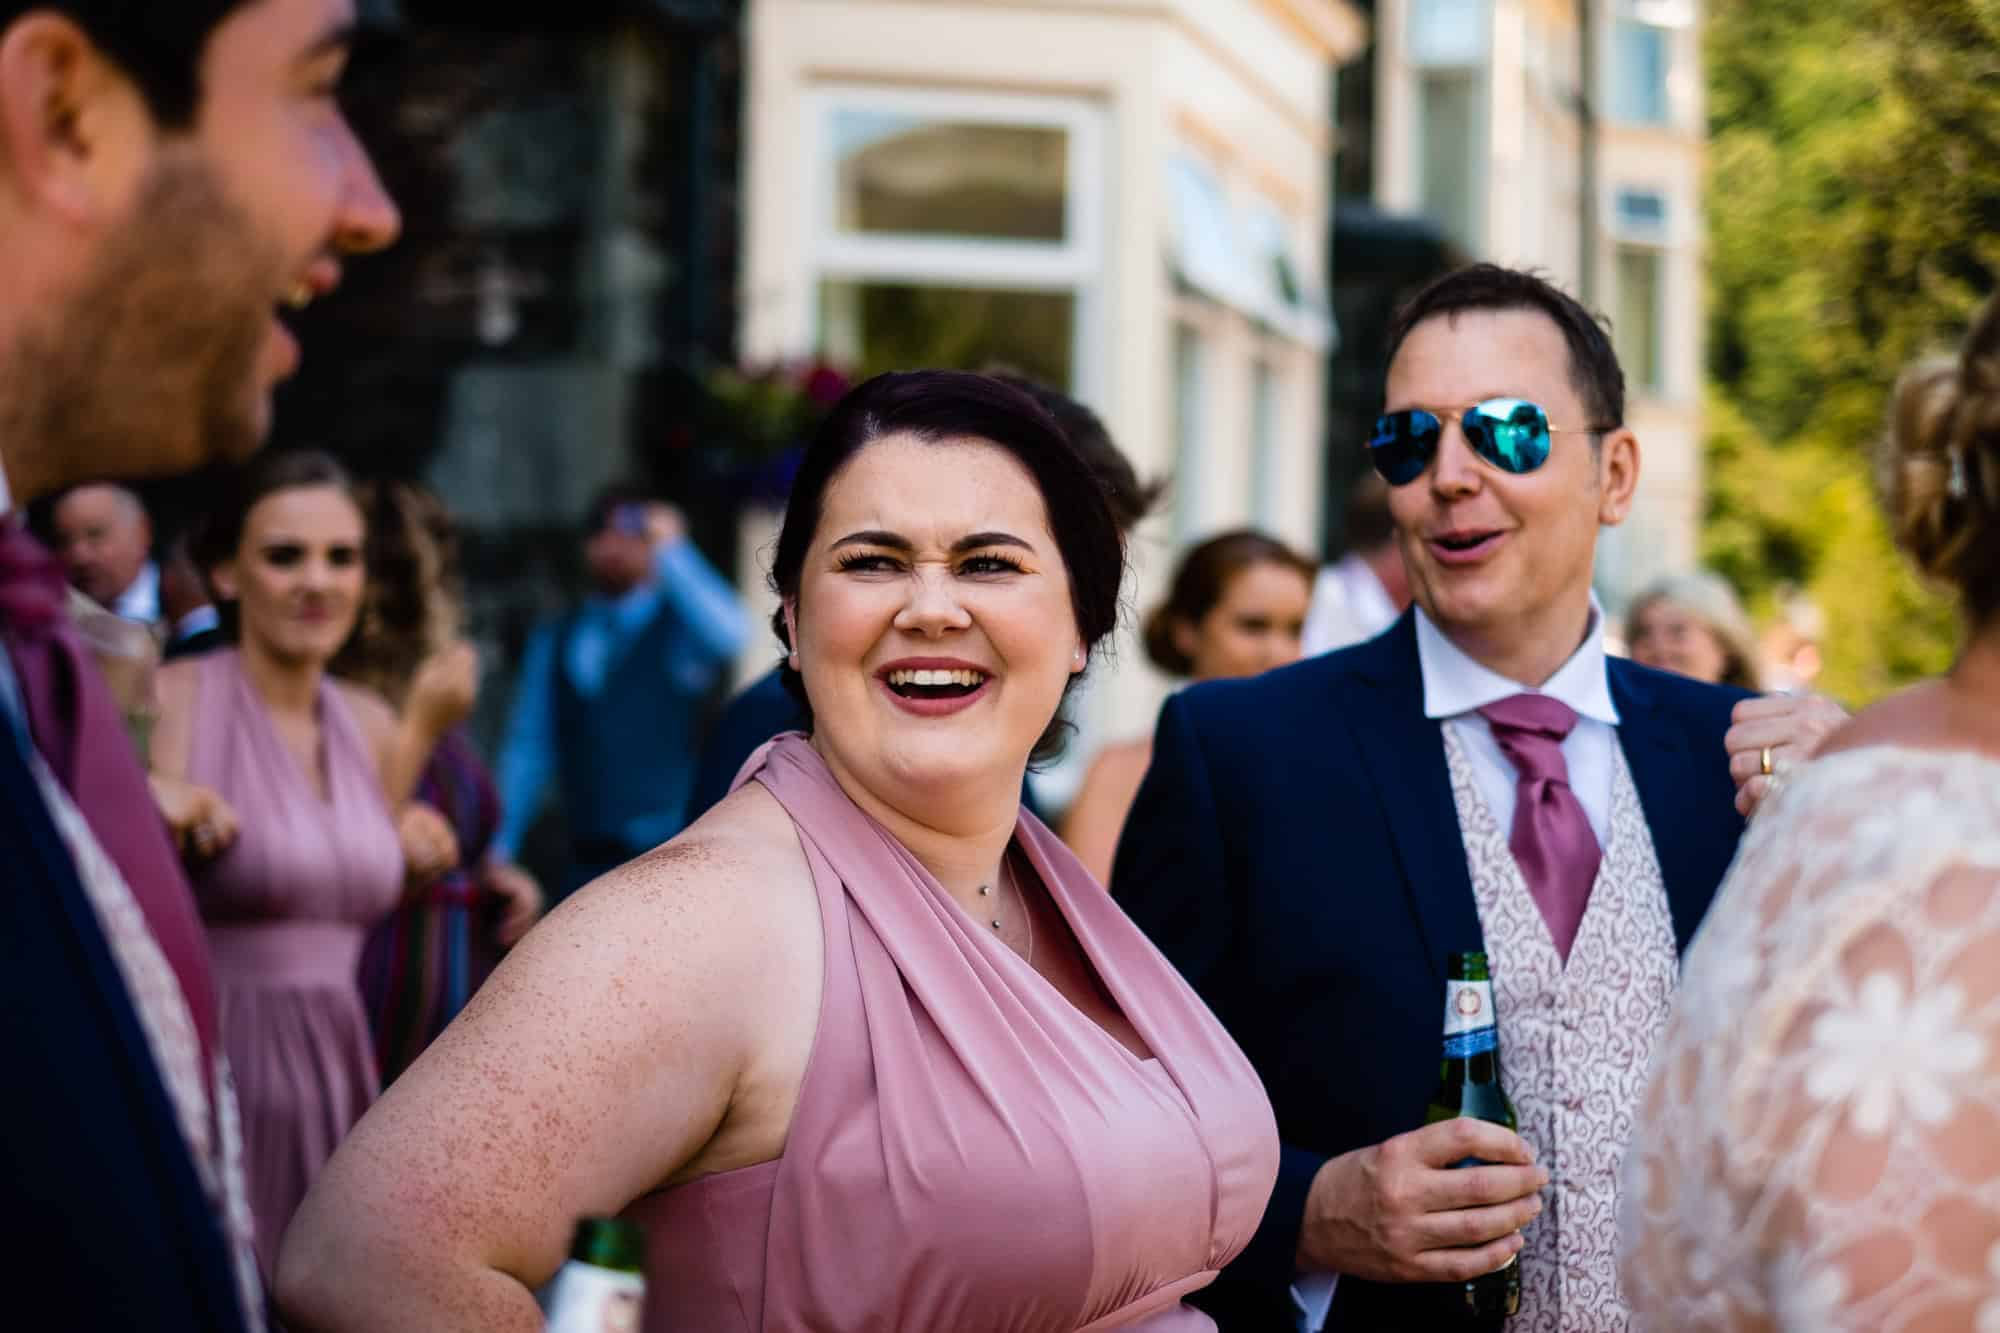 bridesmaid laughing at the groom